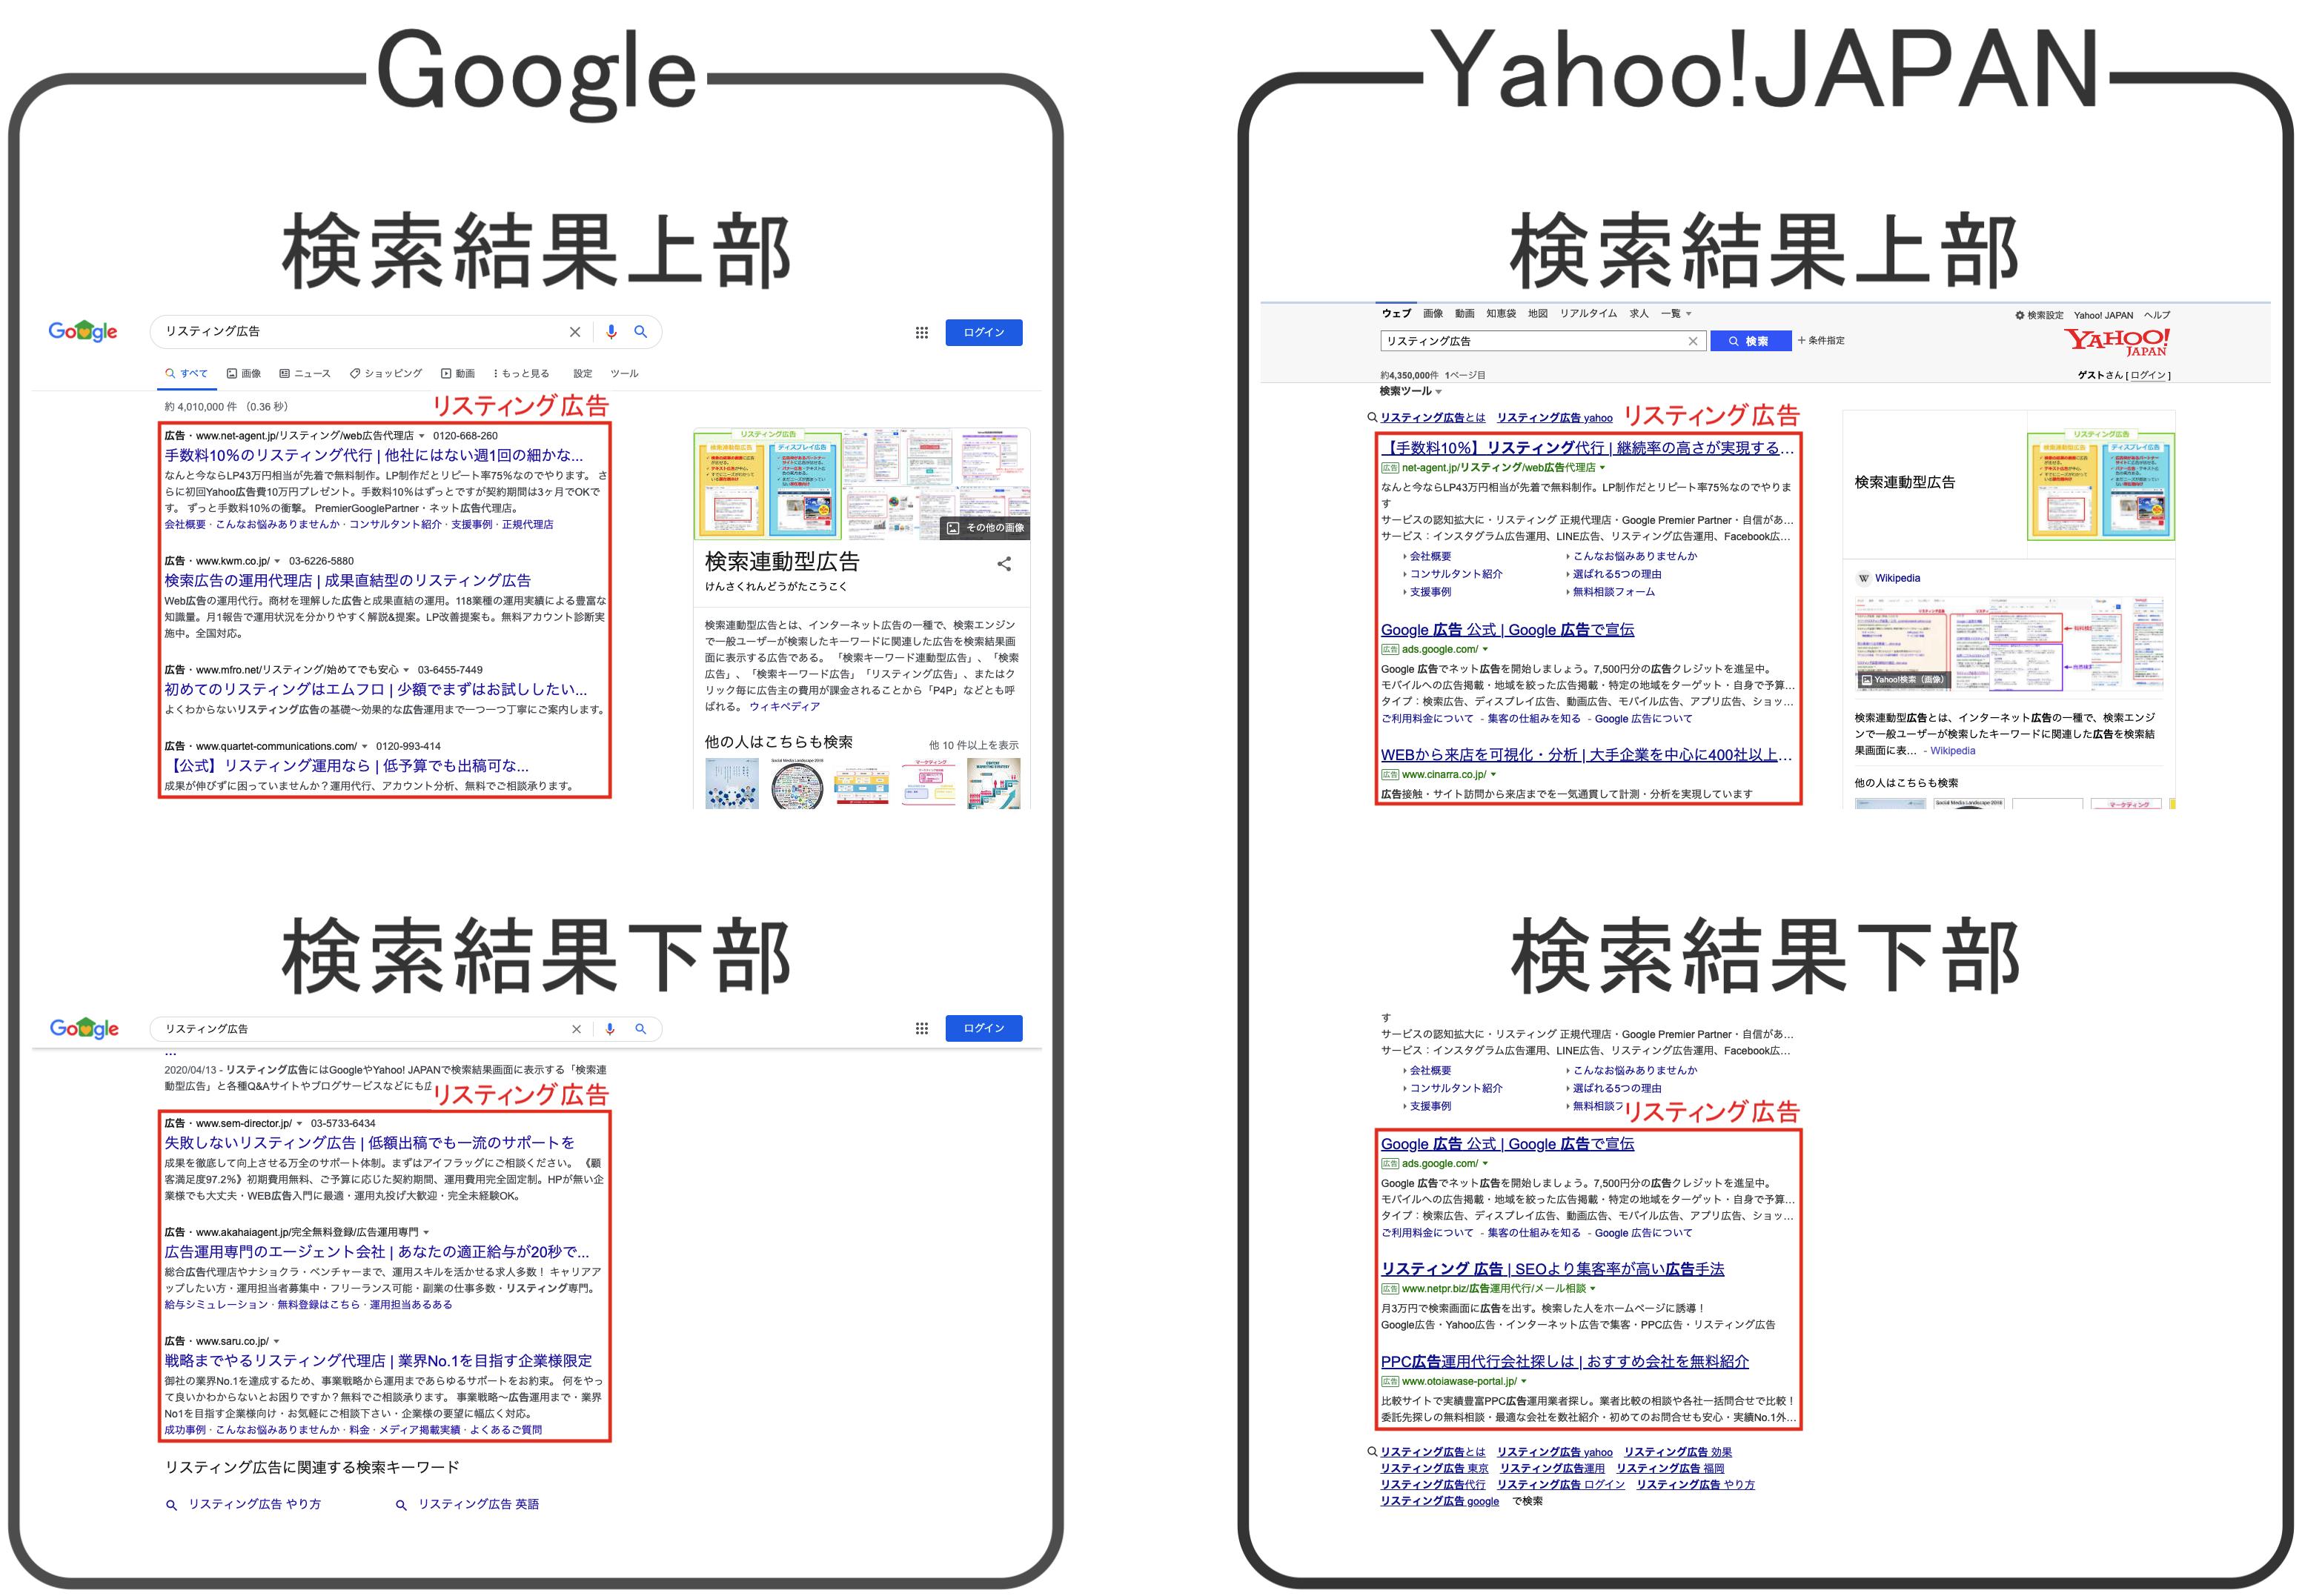 GoogleとYahoo!JAPANのリスティング広告掲載箇所の一覧図